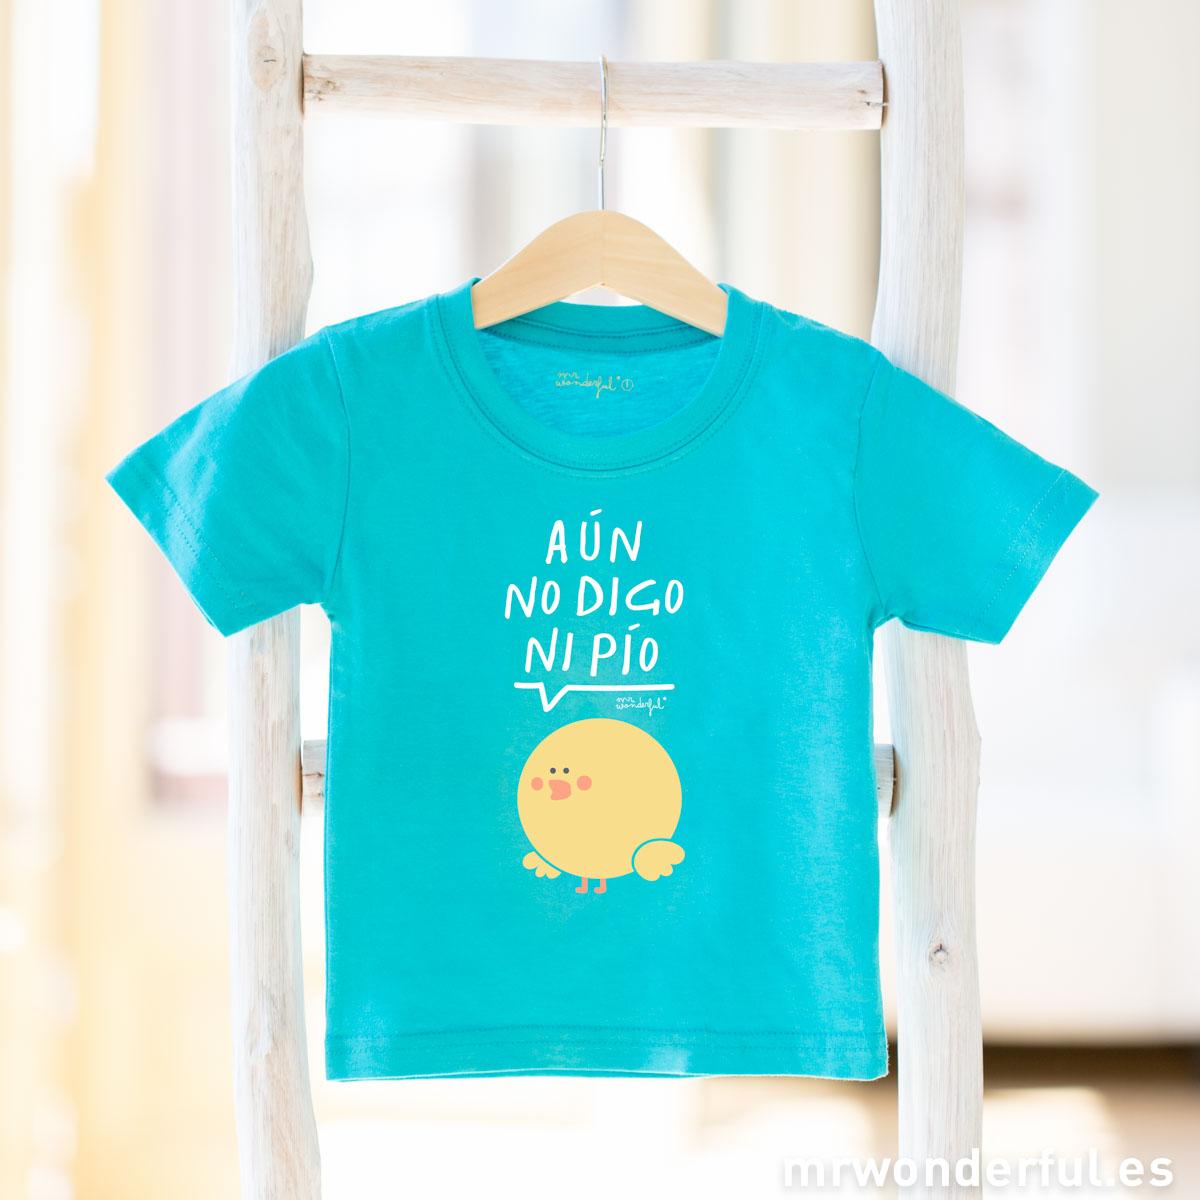 mrwonderful_8436547191000_CAMIS_001_Camiseta-nino-Aun-no-digo-ni-pio-4-Editar-Editar